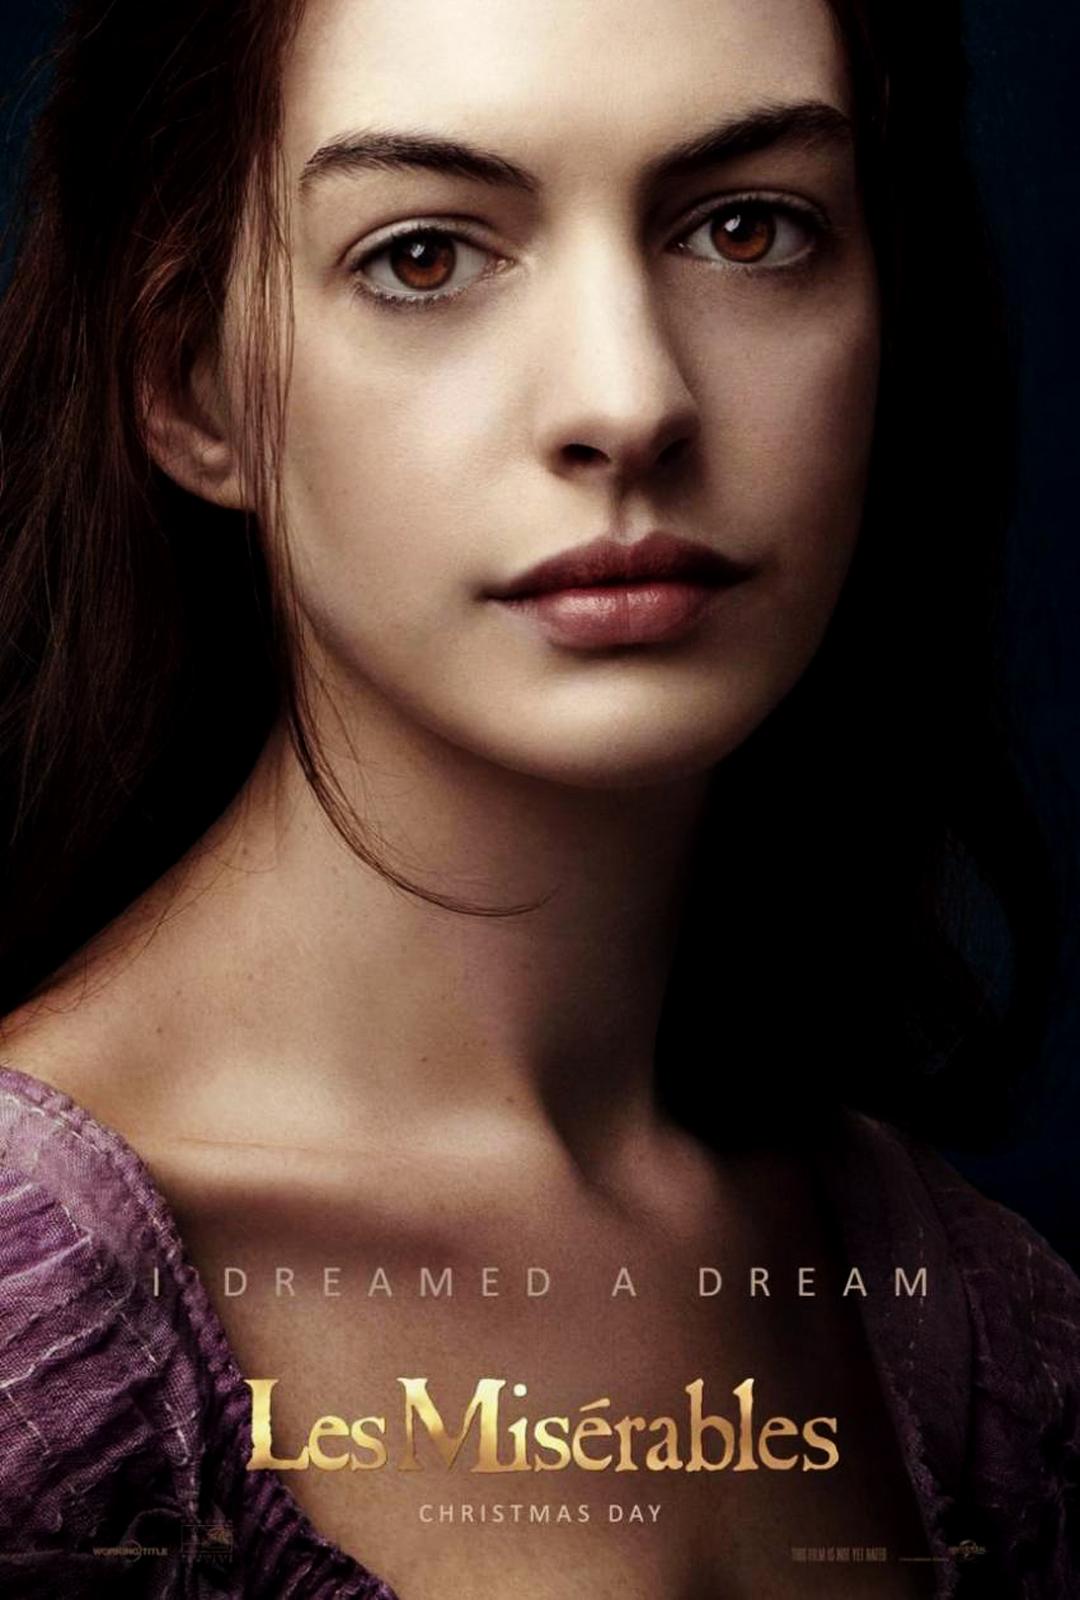 http://2.bp.blogspot.com/-pZI27laqMKk/ULskQ6bO7LI/AAAAAAAAGZ4/YVbTYqblt6g/s1600/Les-Miserables-Anne-Hathaway-Poster_Vvallpaper.Net.jpg